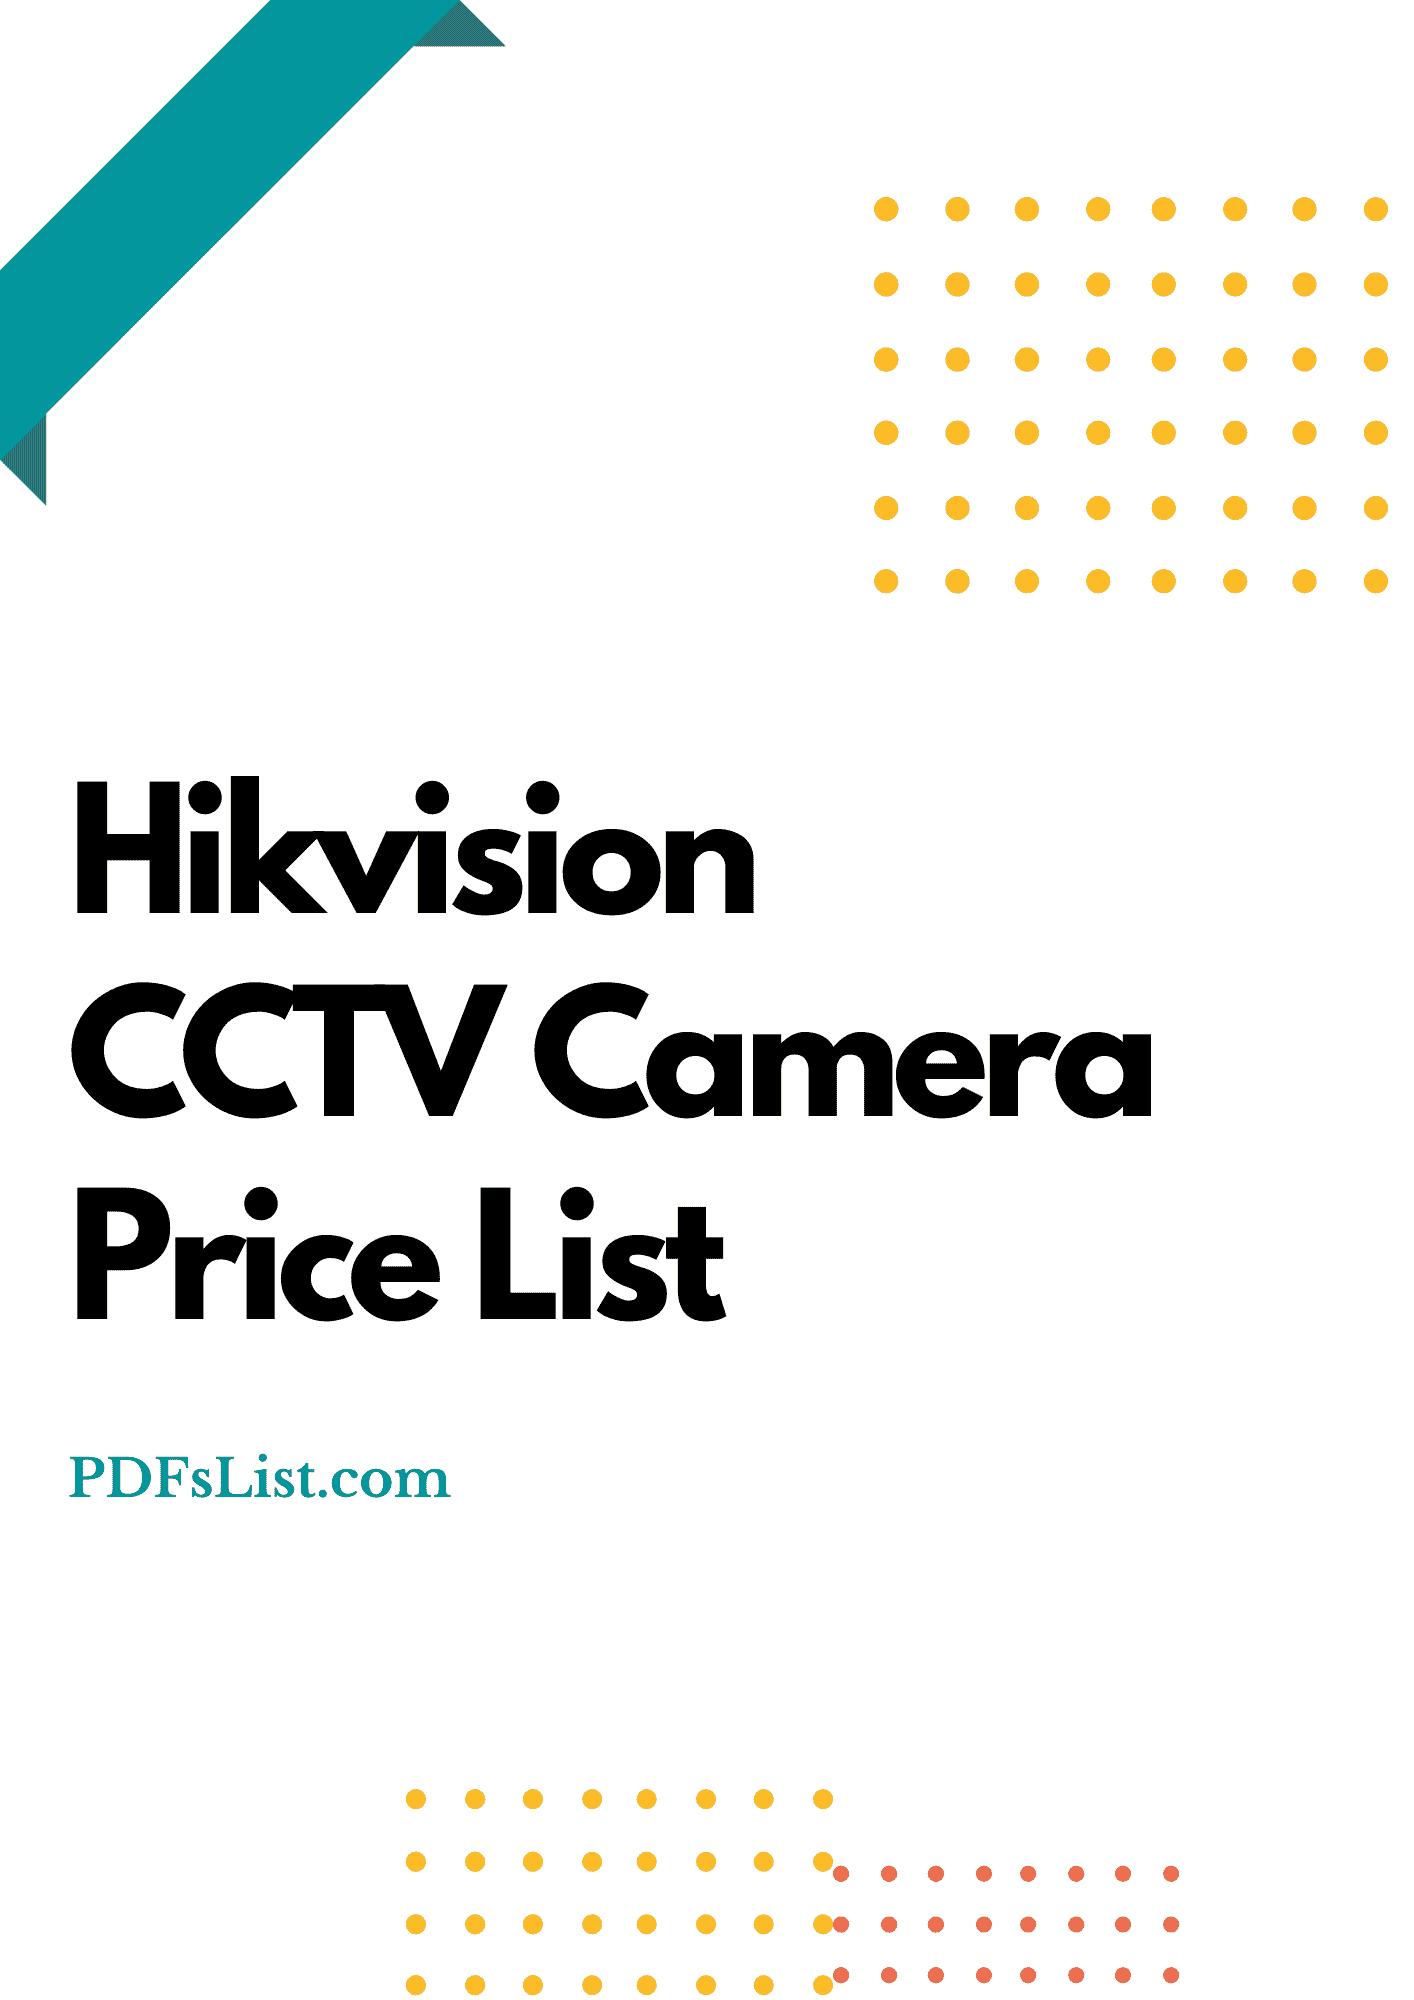 Hikvision CCTV Camera Price List